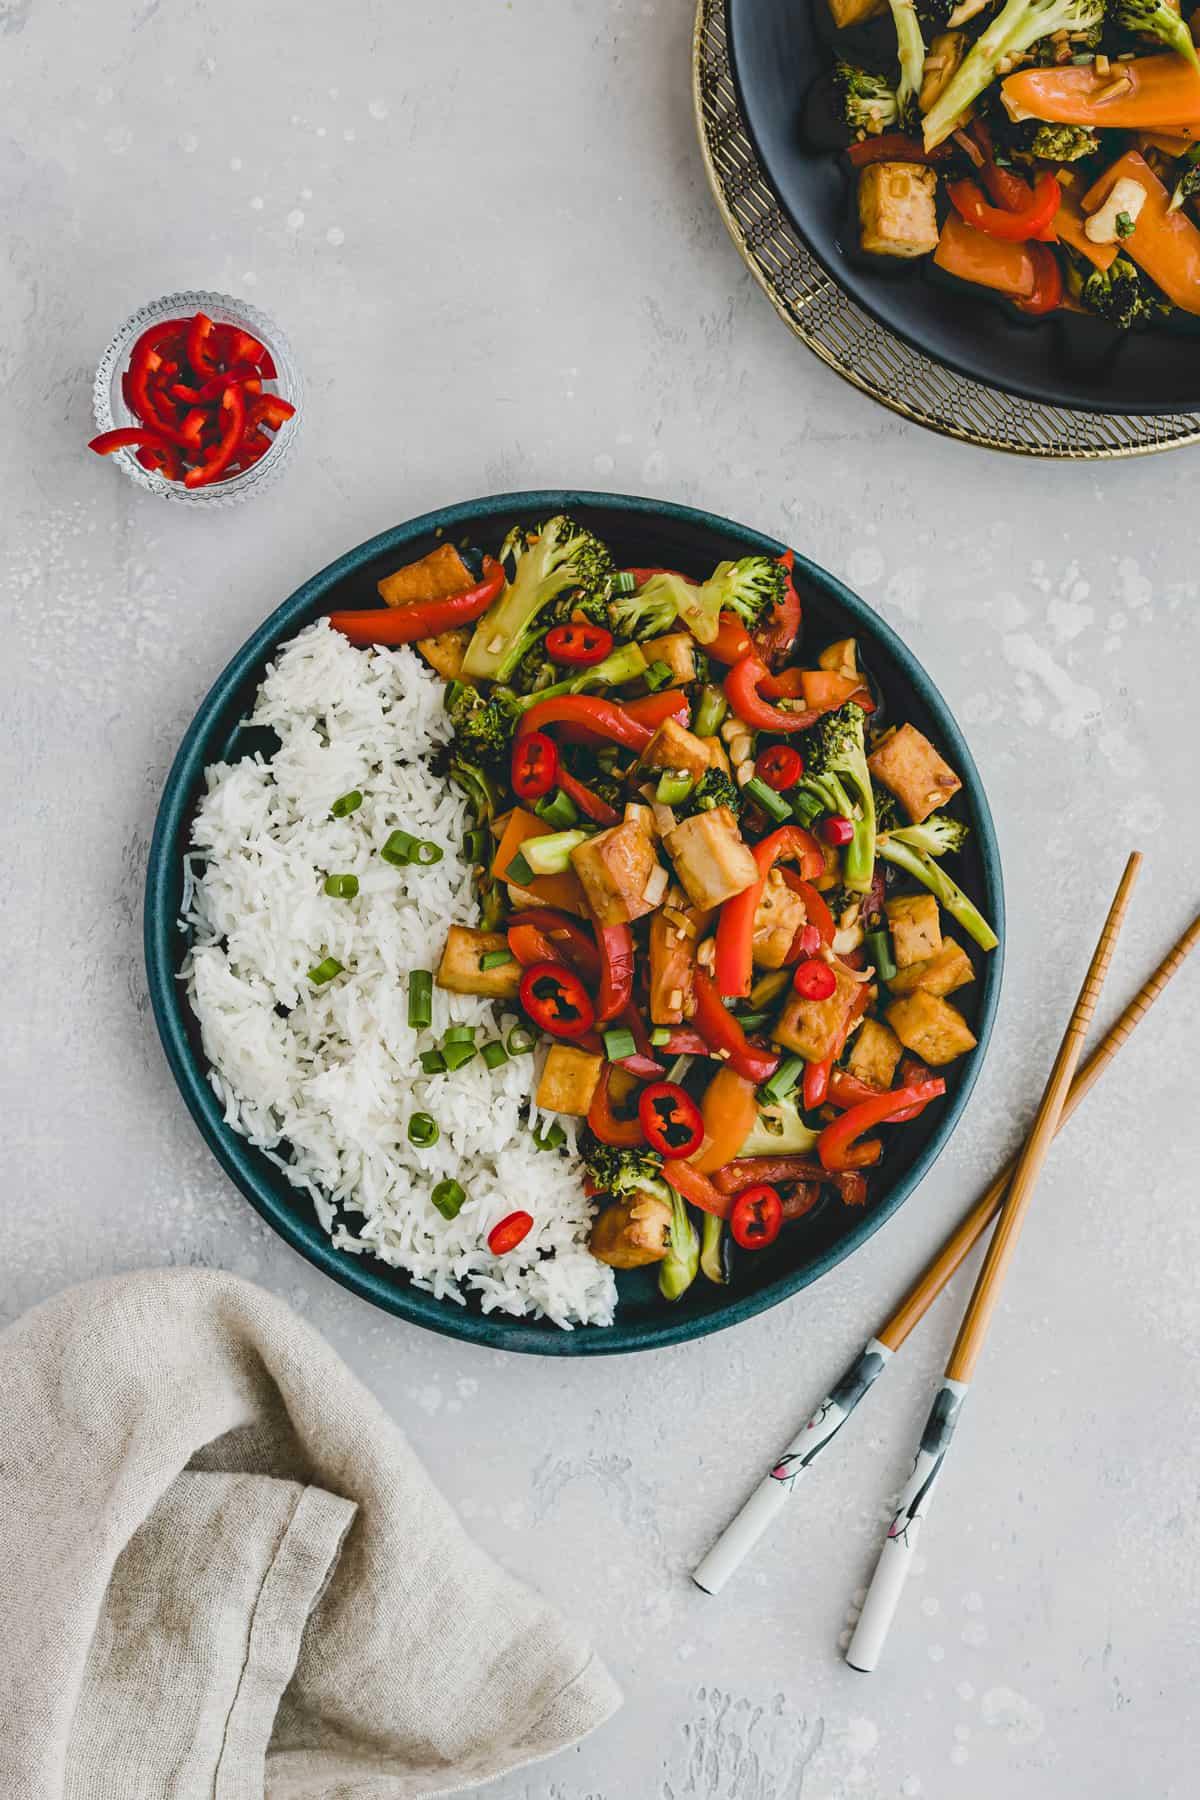 two plates of tofu vegetable stir fry